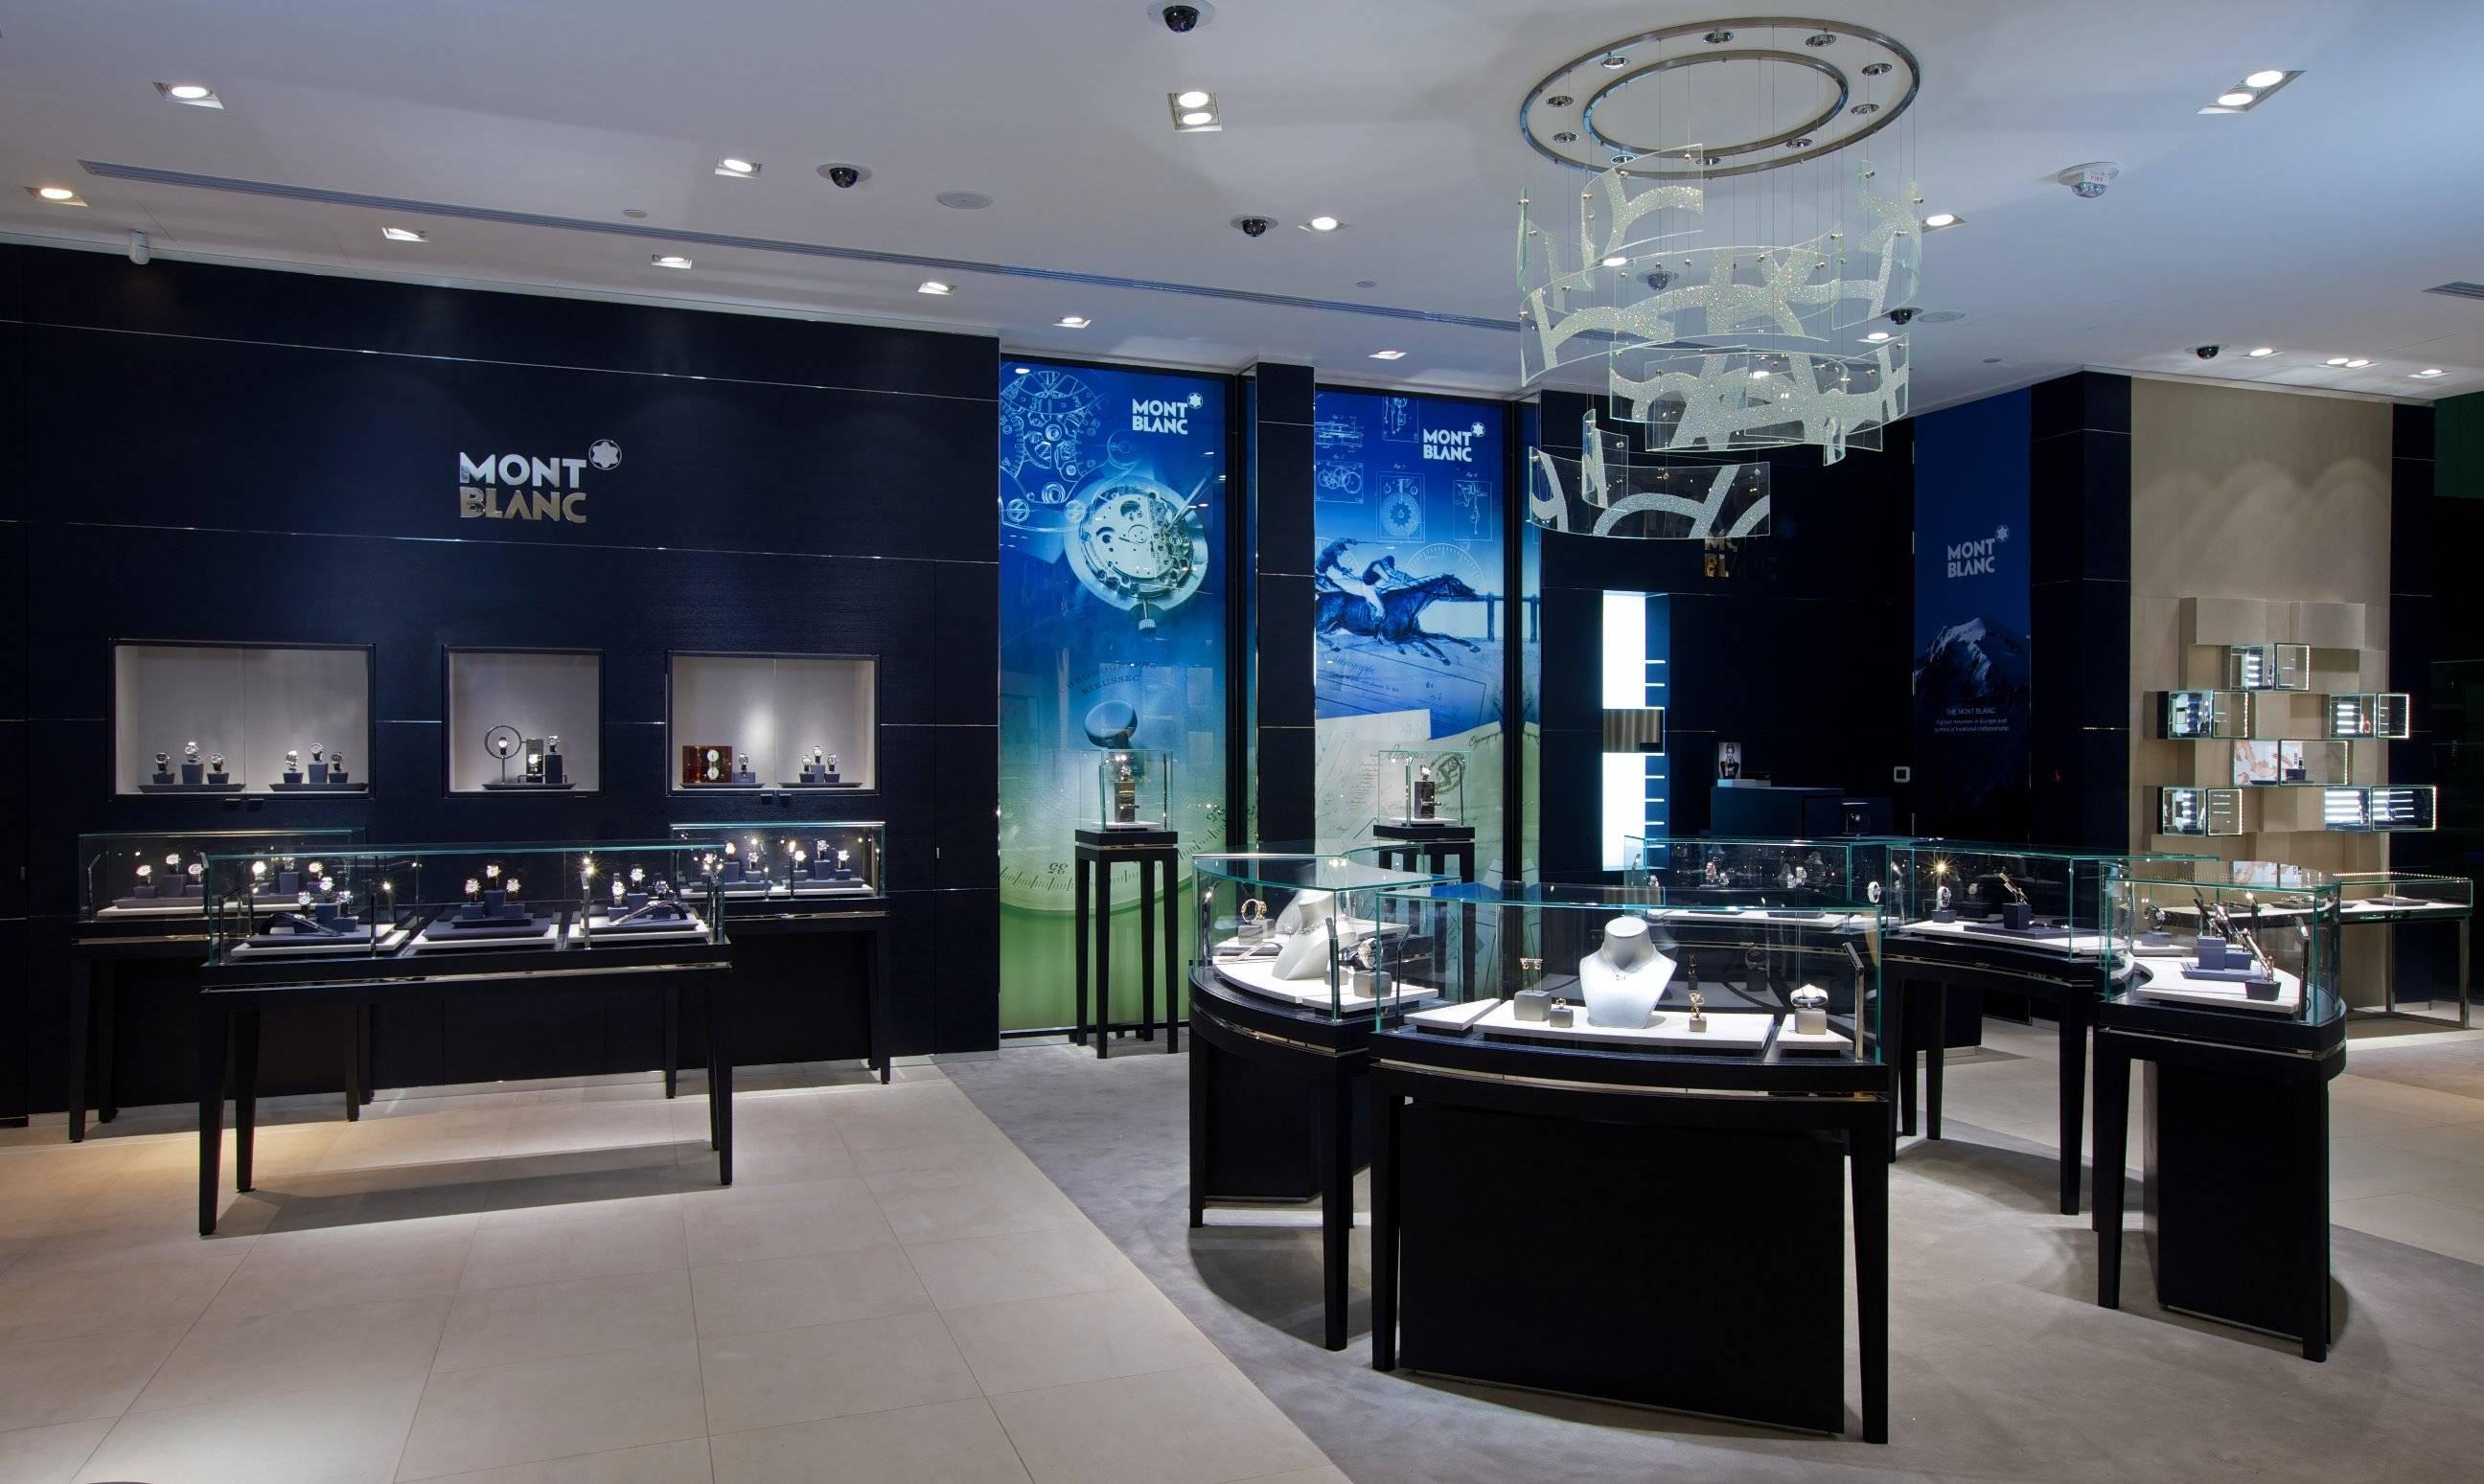 Montblanc Boutique in The Galleria on Al Maryah Island